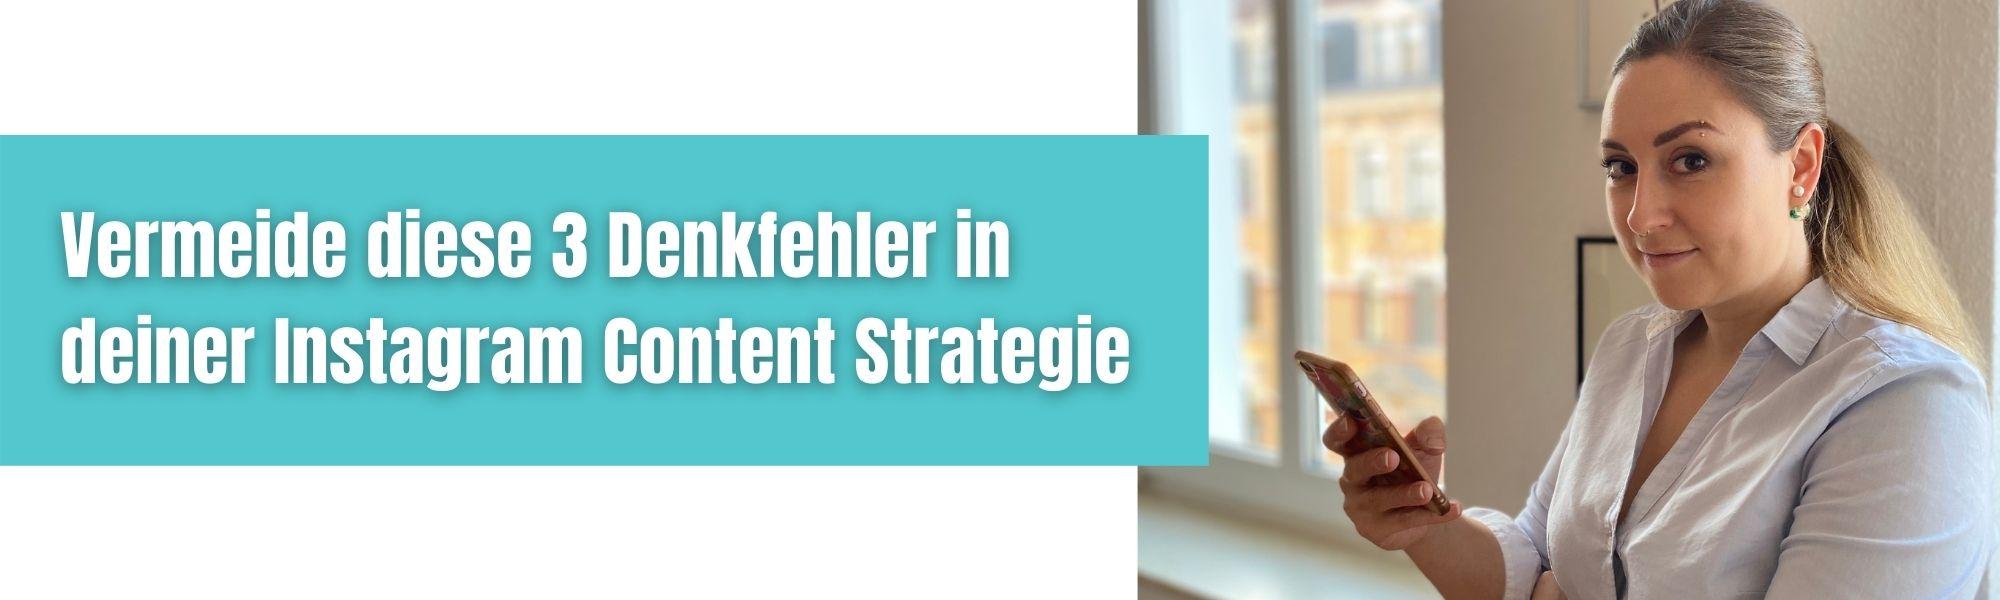 3 Denkfehler Instagram Content Strategie